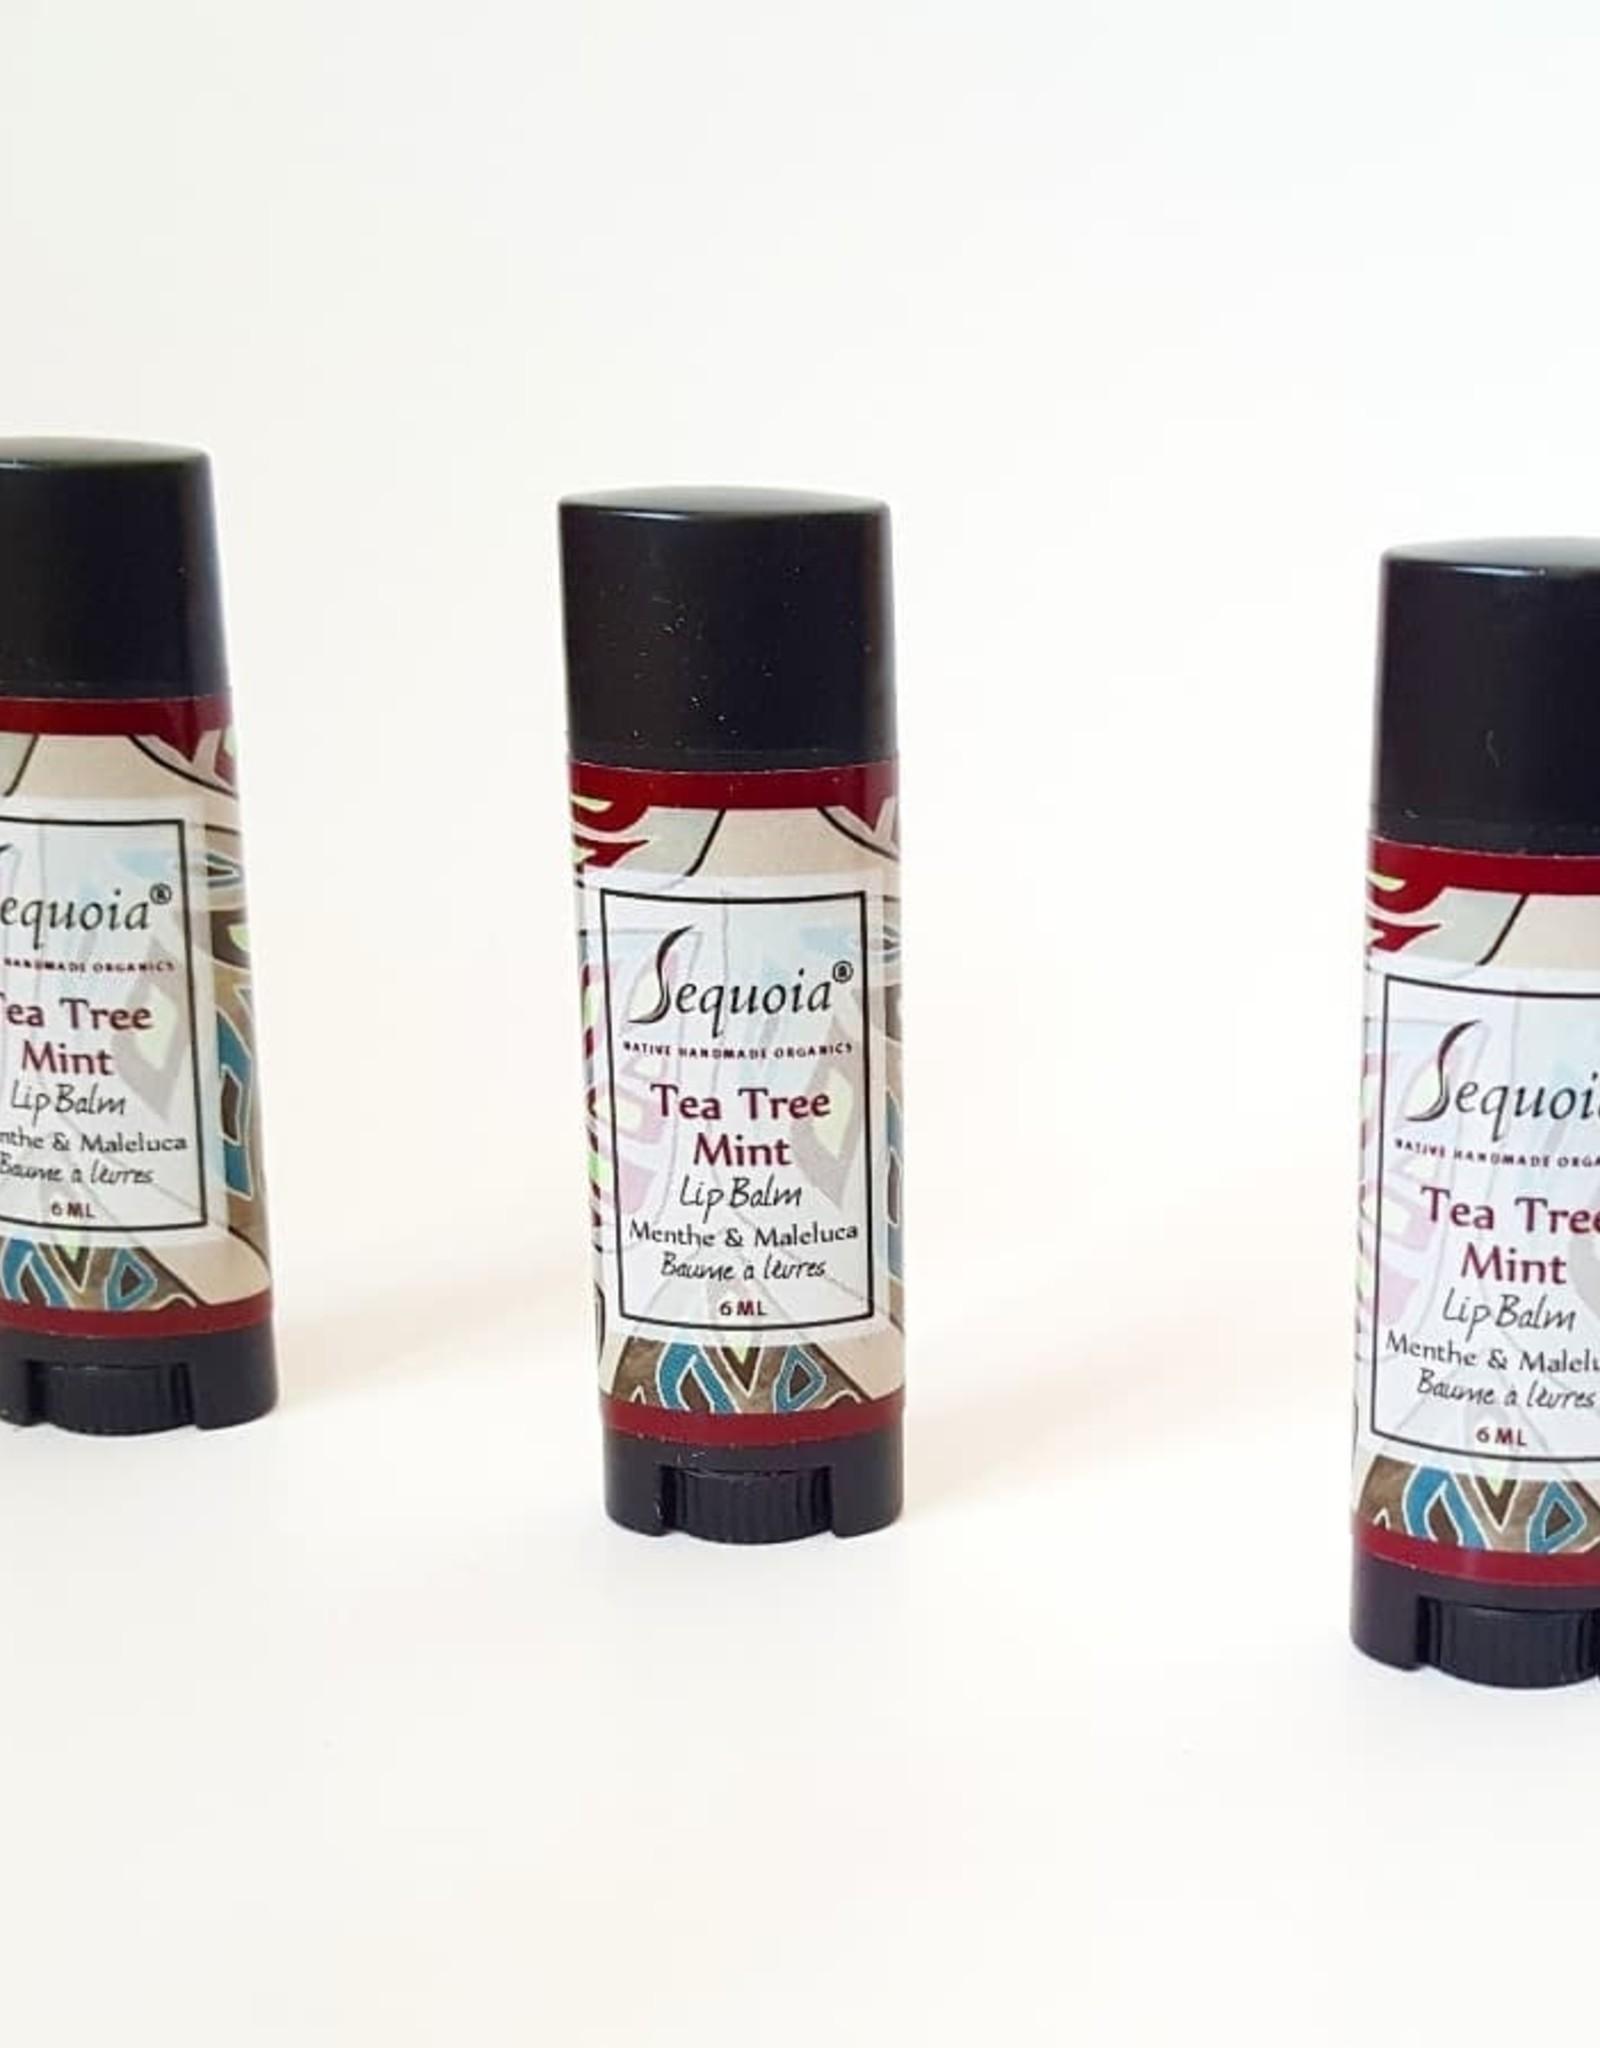 Sequoia Tea Tree Mint Lip Balm